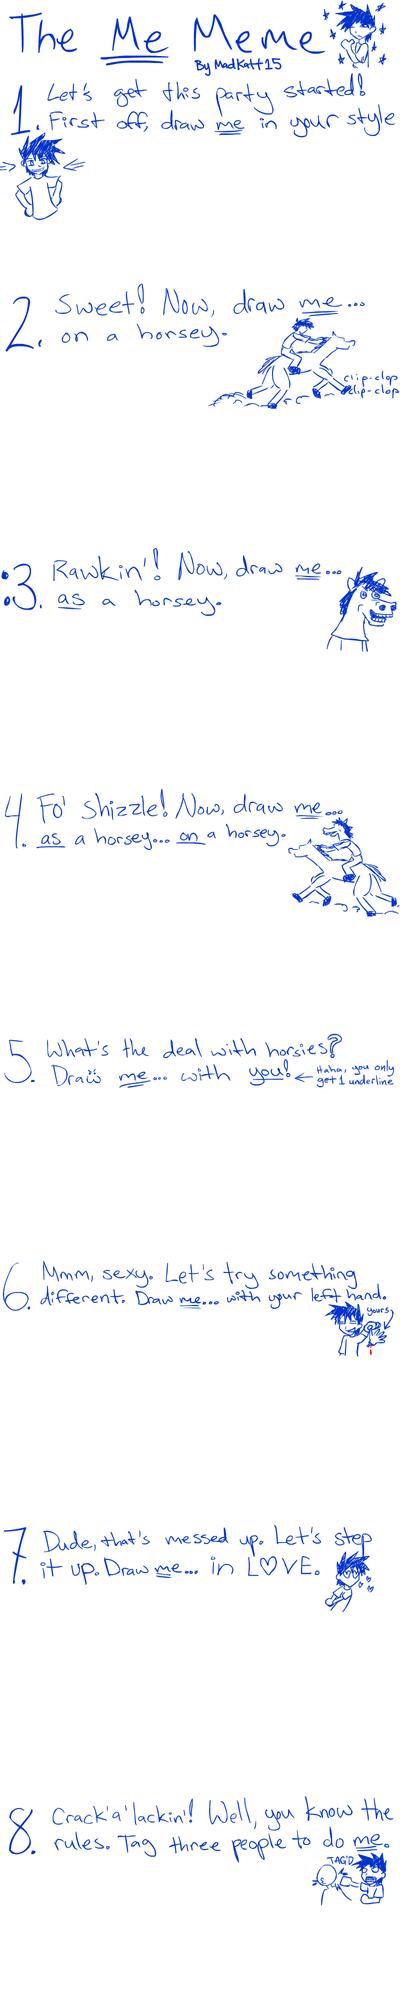 The Me Meme by MadKatt15